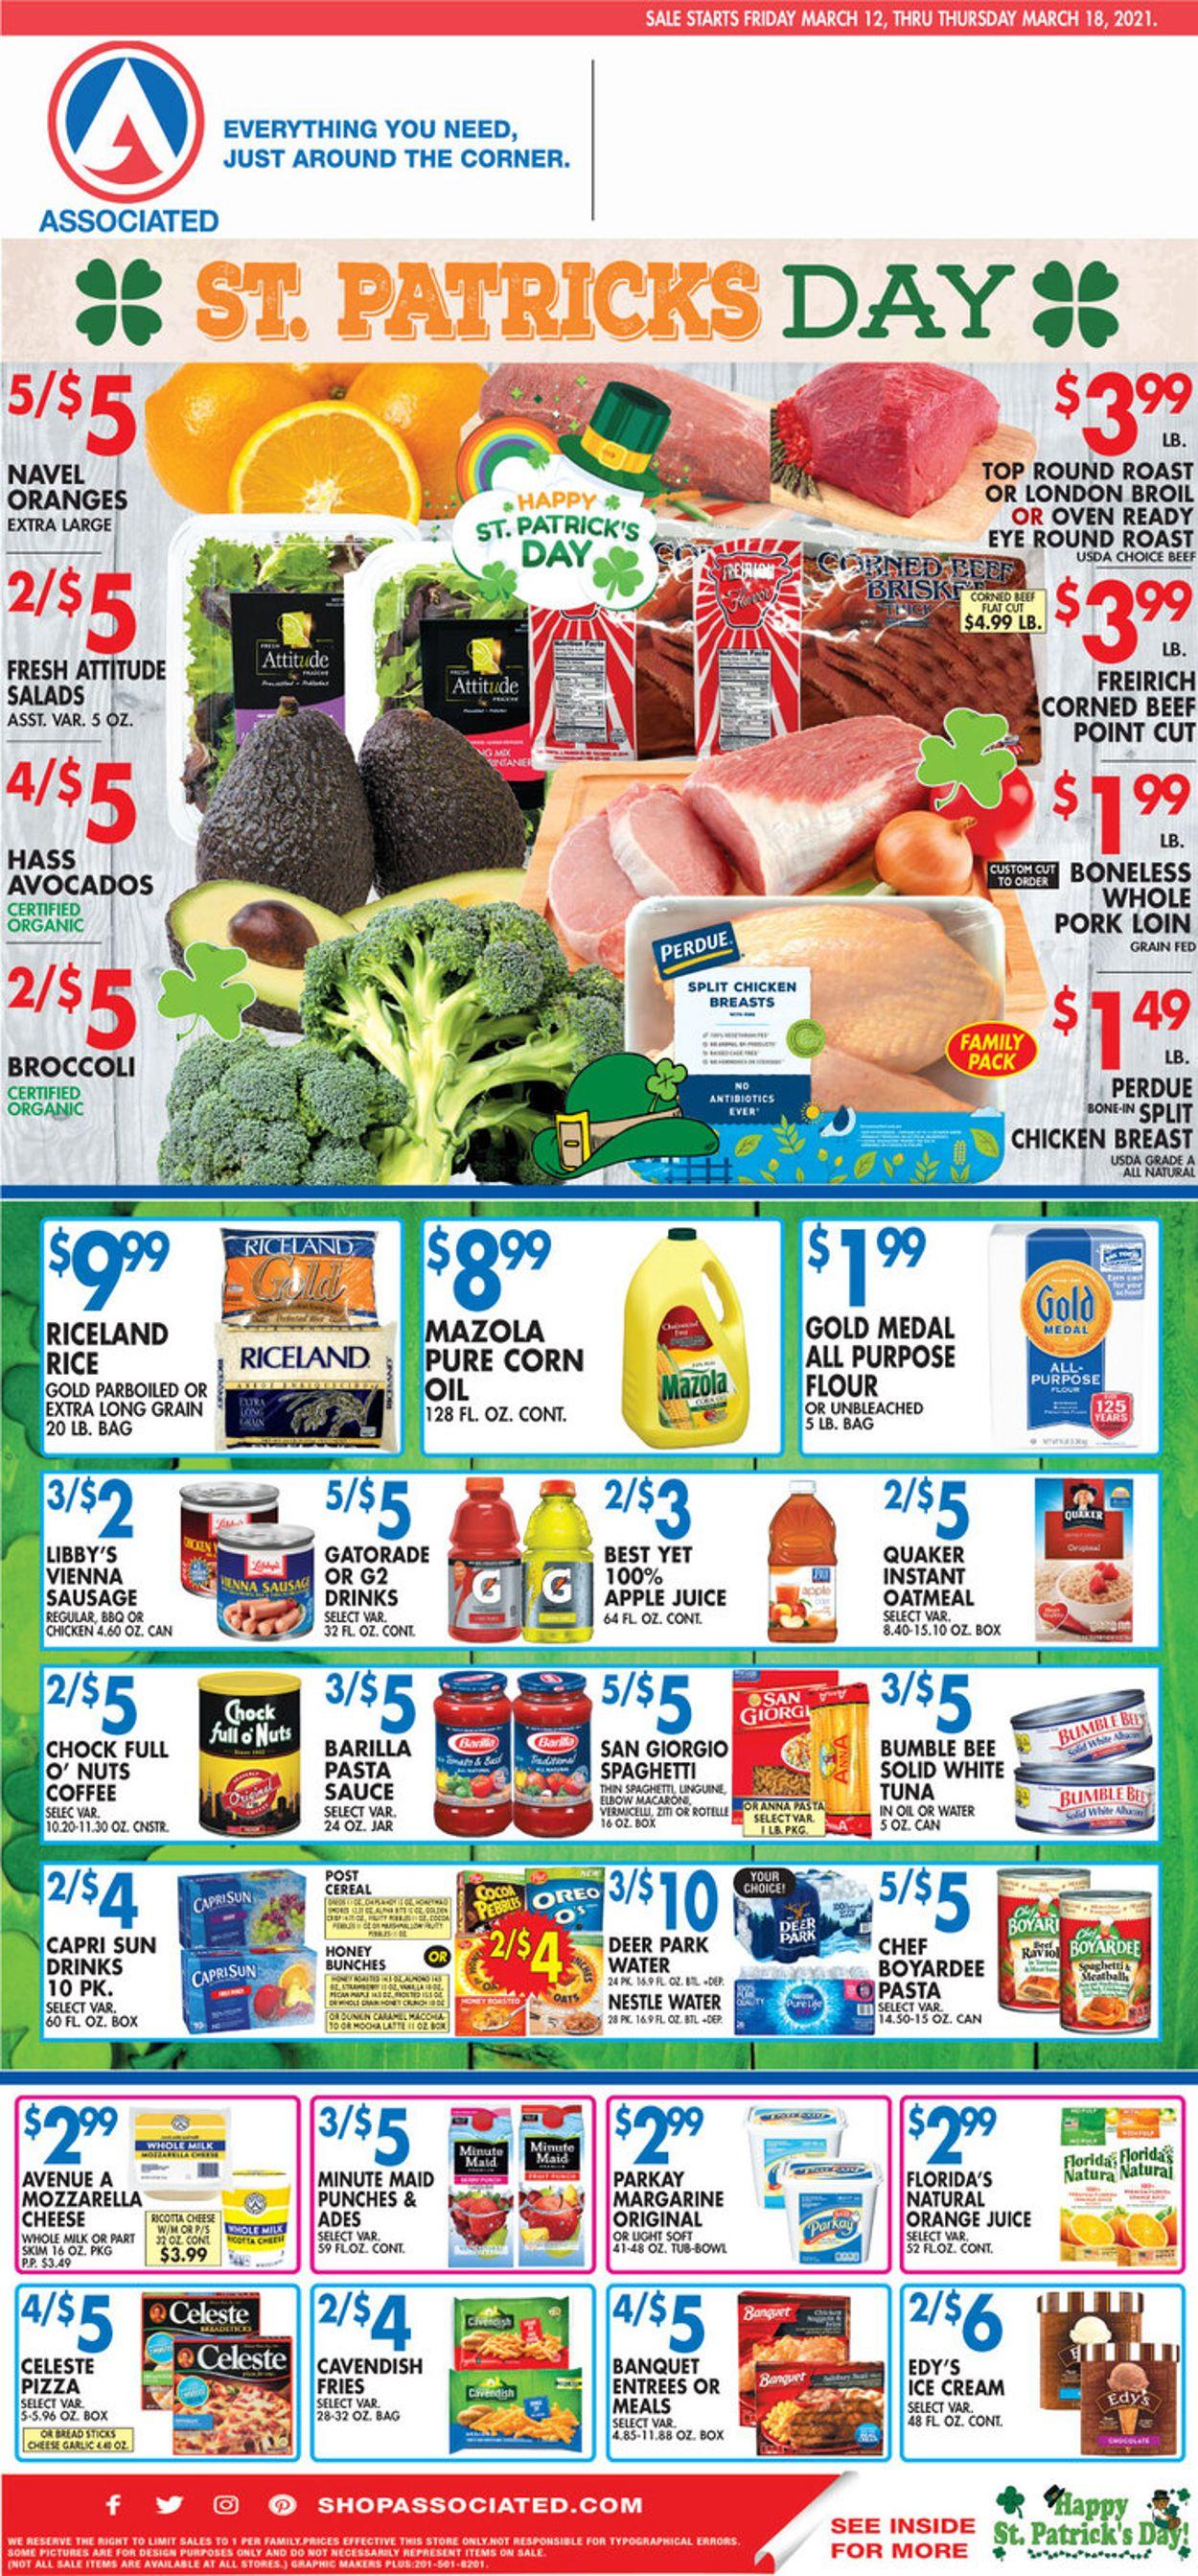 Associated Supermarkets Weekly Ad Circular - valid 03/12-03/18/2021